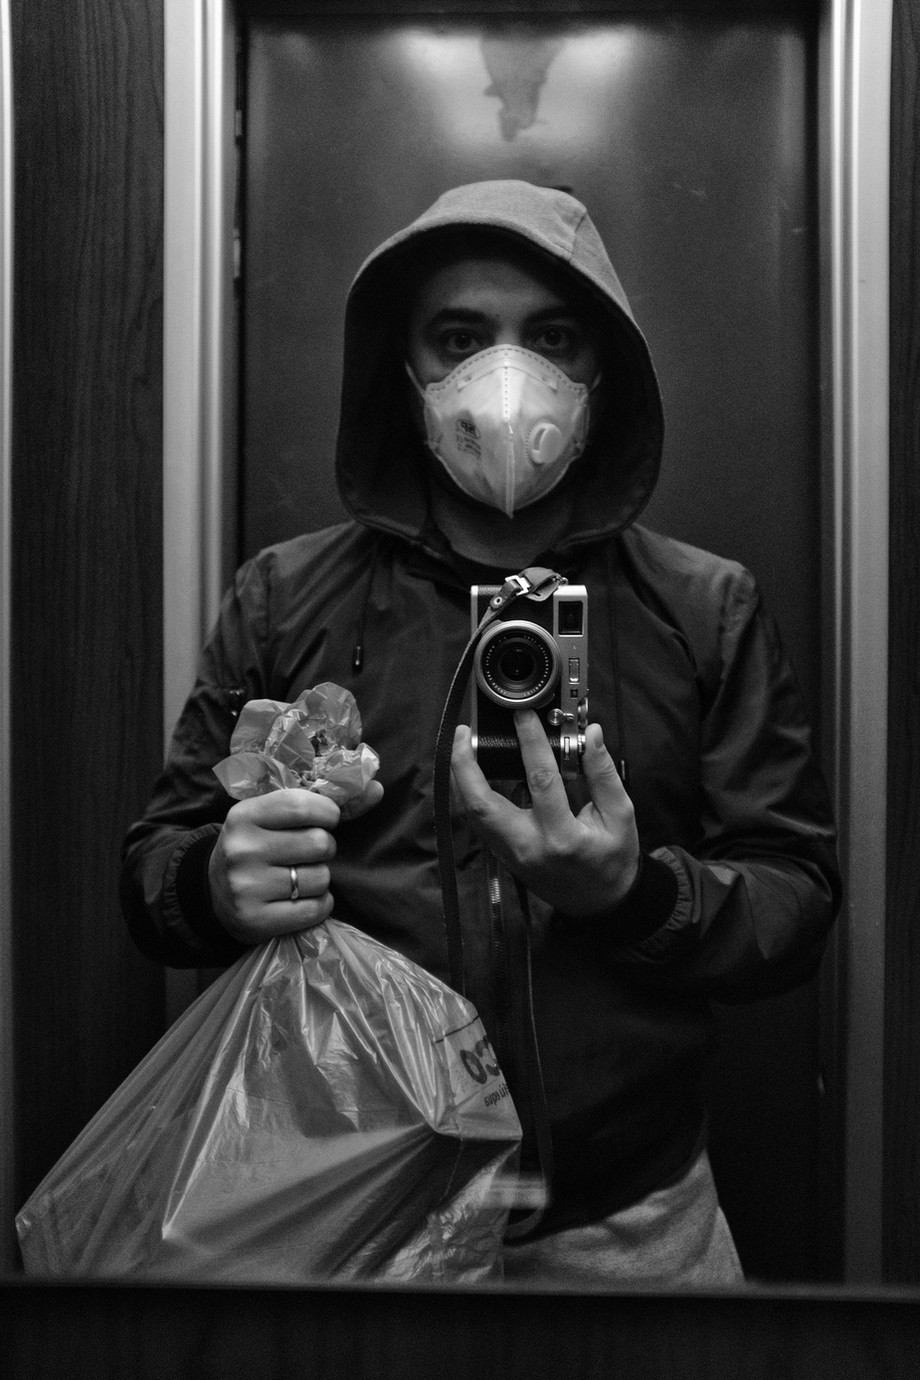 Gianluca Colonnese racconta Lockdown: fotografie di una famiglia in quarantena / Gianluca Colonnese